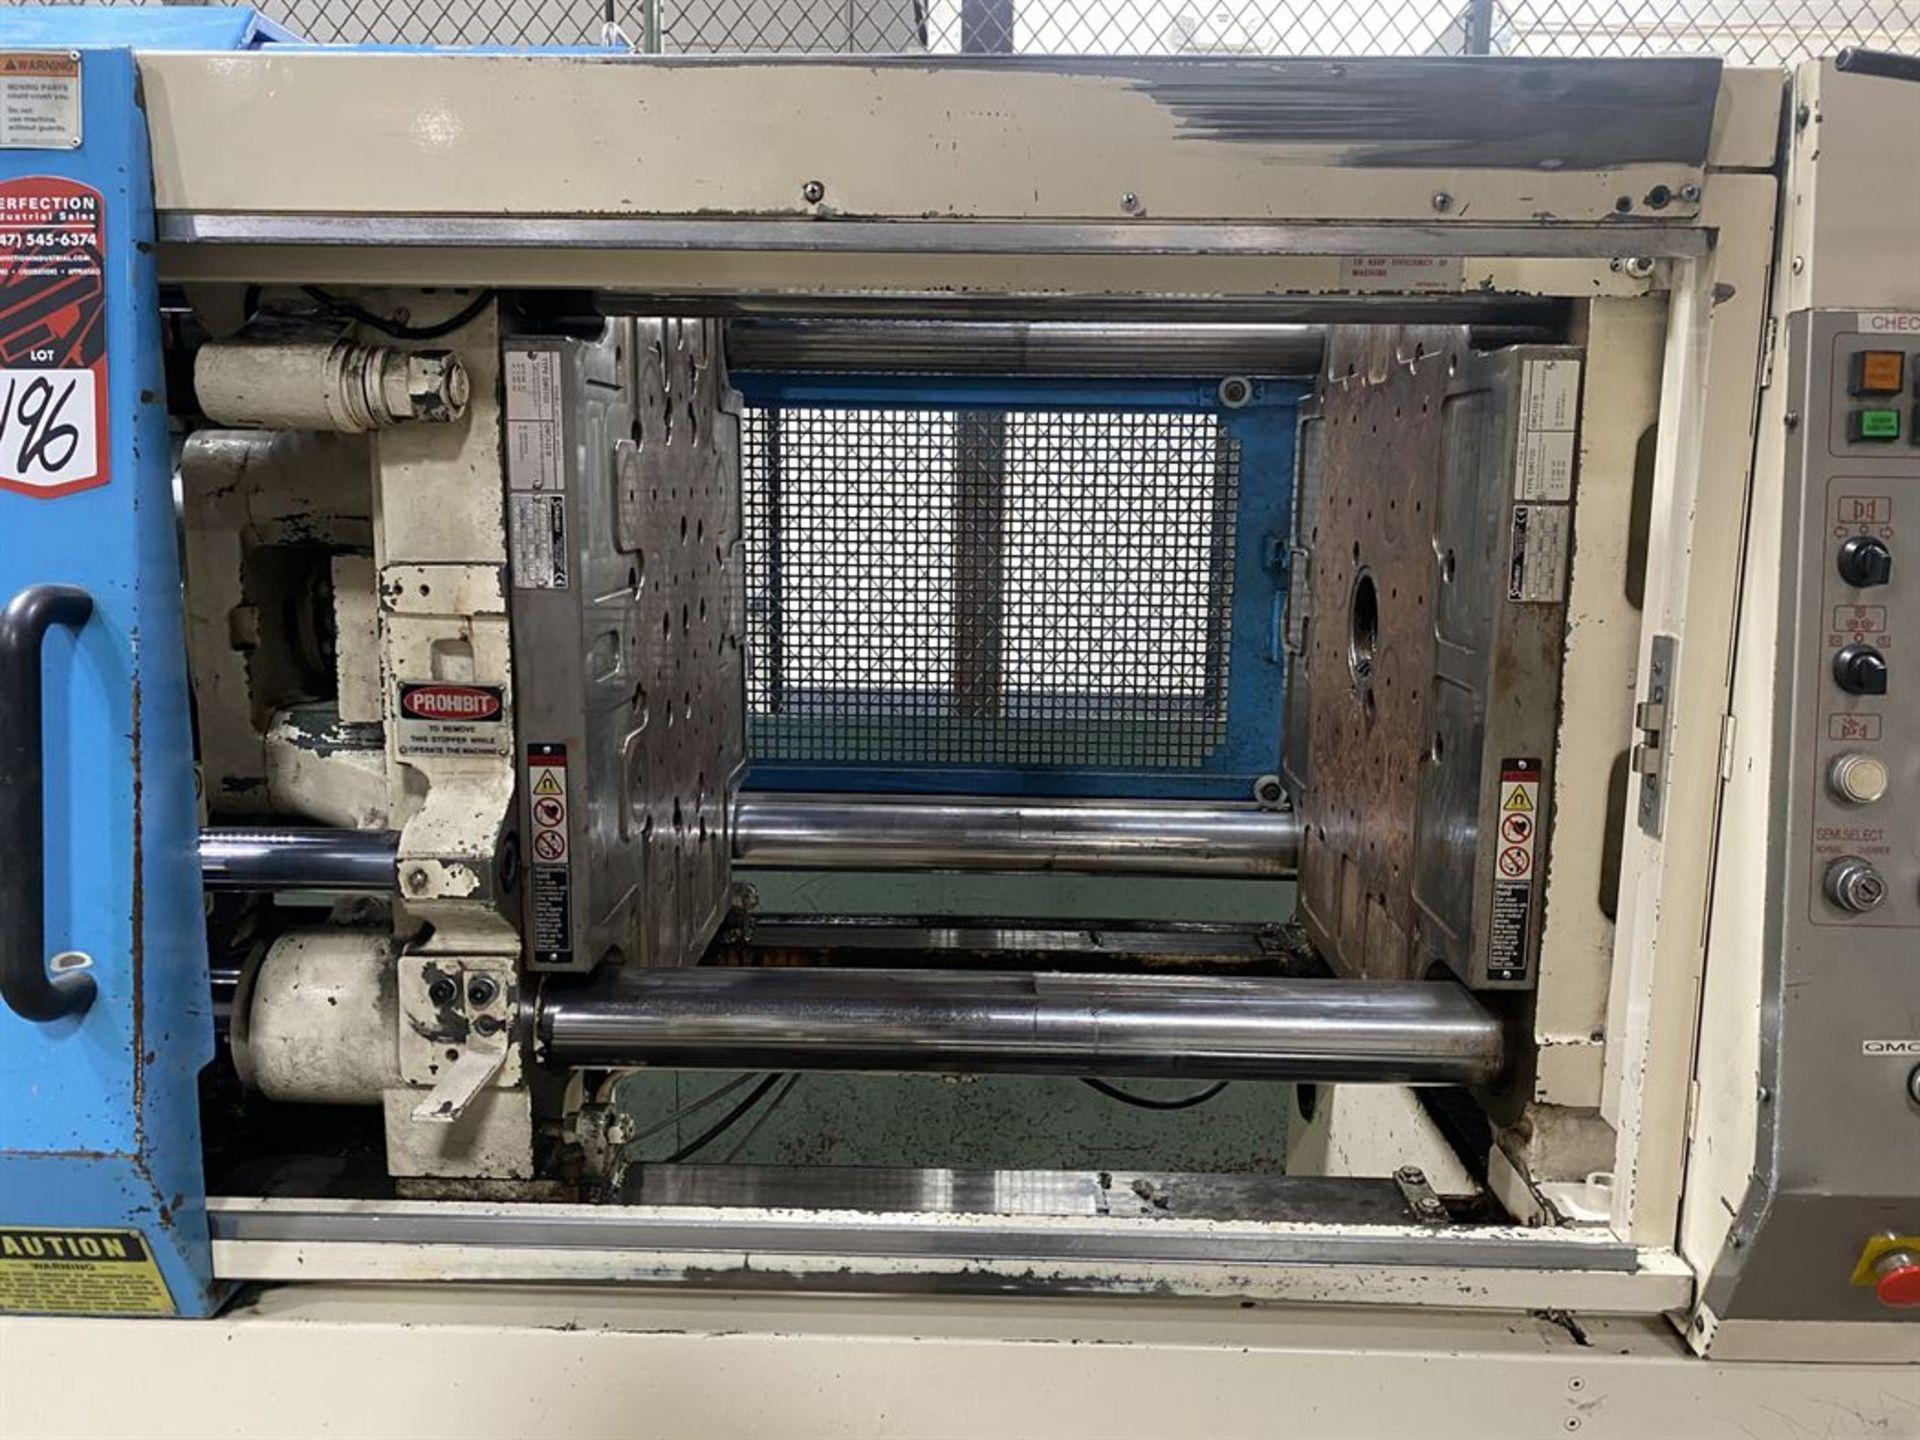 Lot 196 - NISSEI FN4000 200 Ton Hydraulic Injection Molder, s/n S18S297, w/ 14 oz Shot Size, GP Screw,